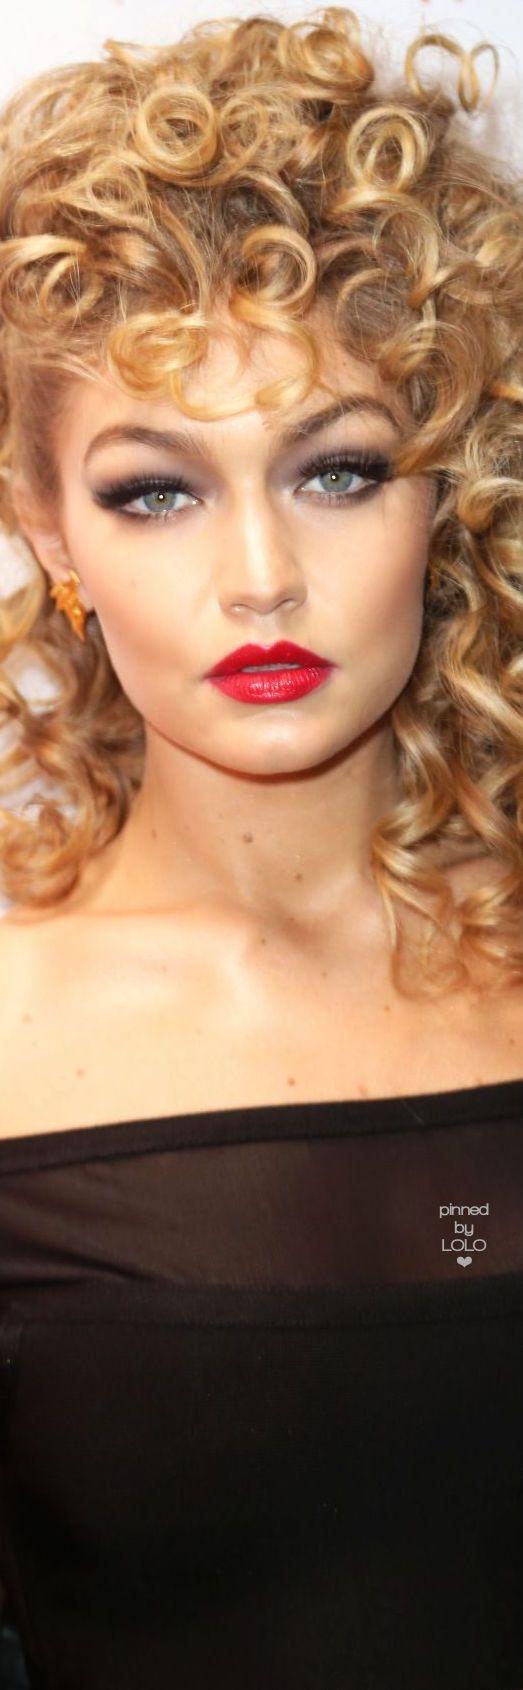 Gigi Hadid rocks Sandy from Grease for Halloween | LOLO❤︎